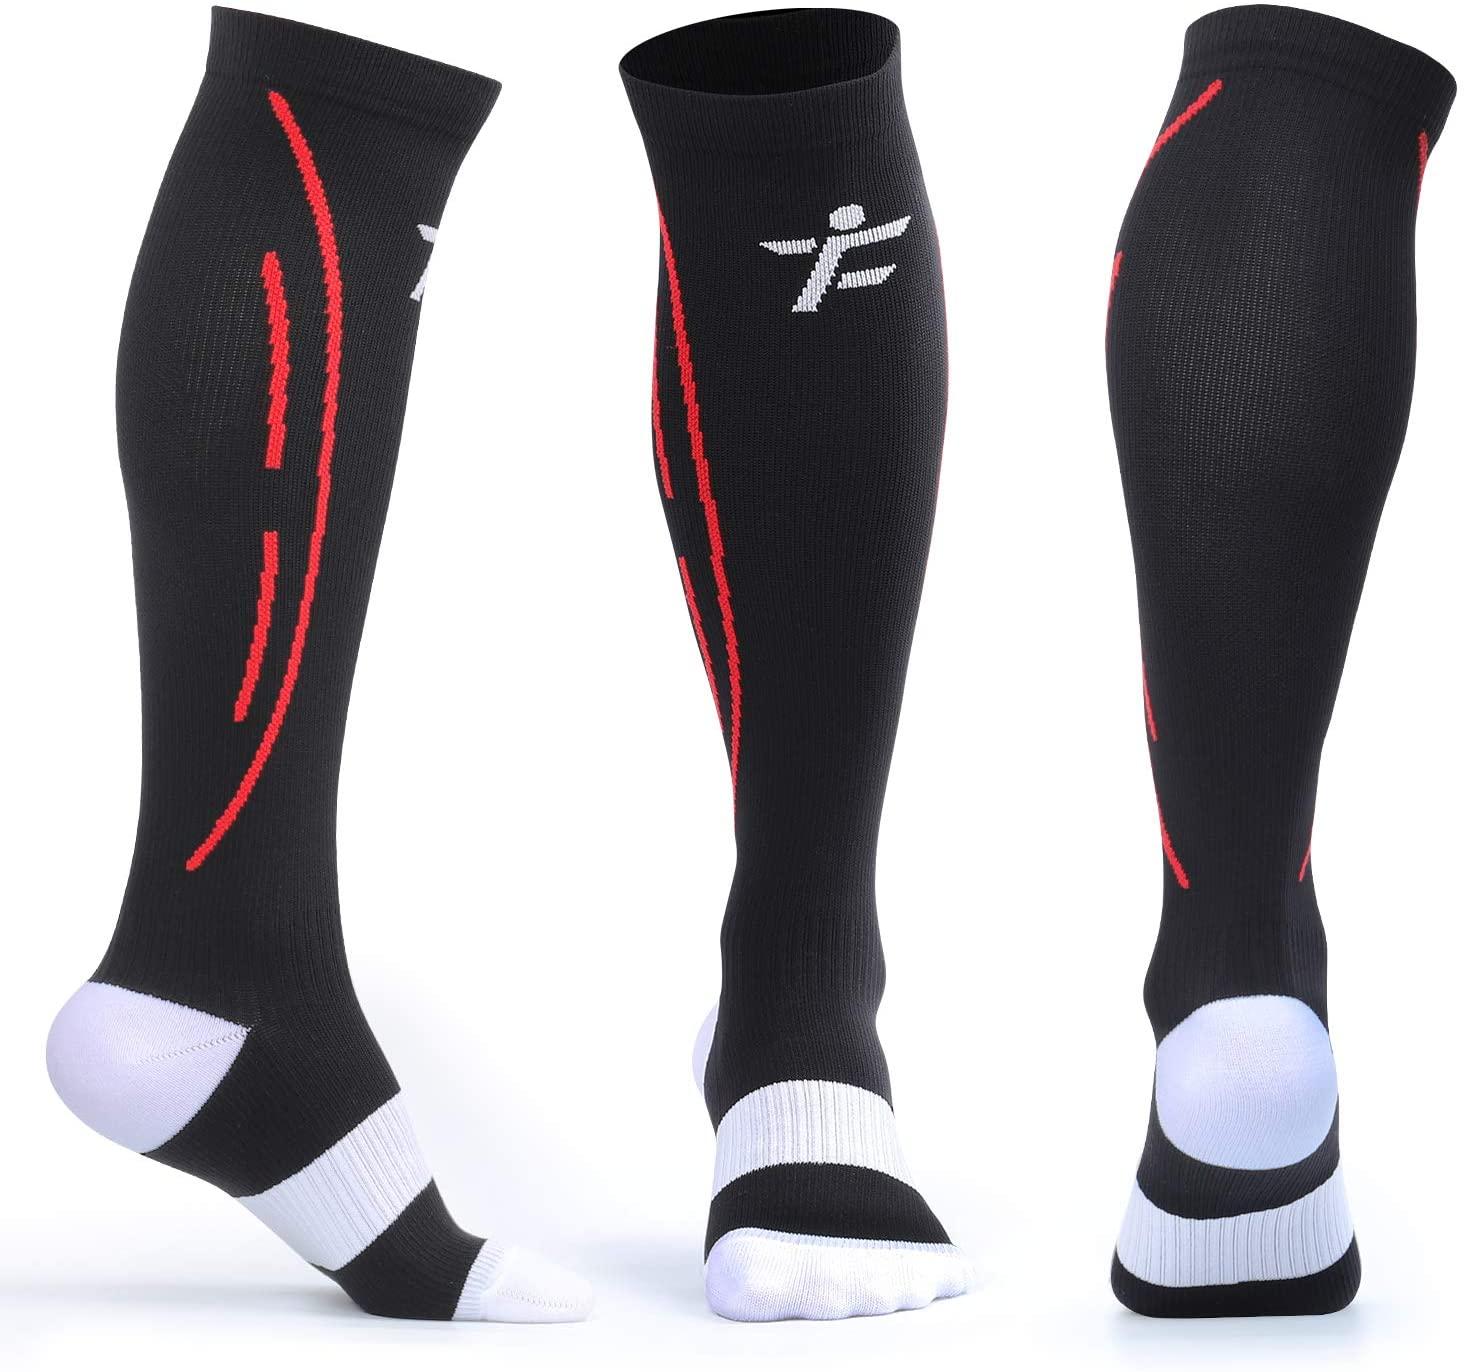 AMZAM Compression Socks for Men & Women, 2 Pairs, 15-25mmHg Graduated Nursing Compression Stockings for Athletic Sports, Running, Cycling, Flight, Travel, Nurse, Pregnancy, White + Black M